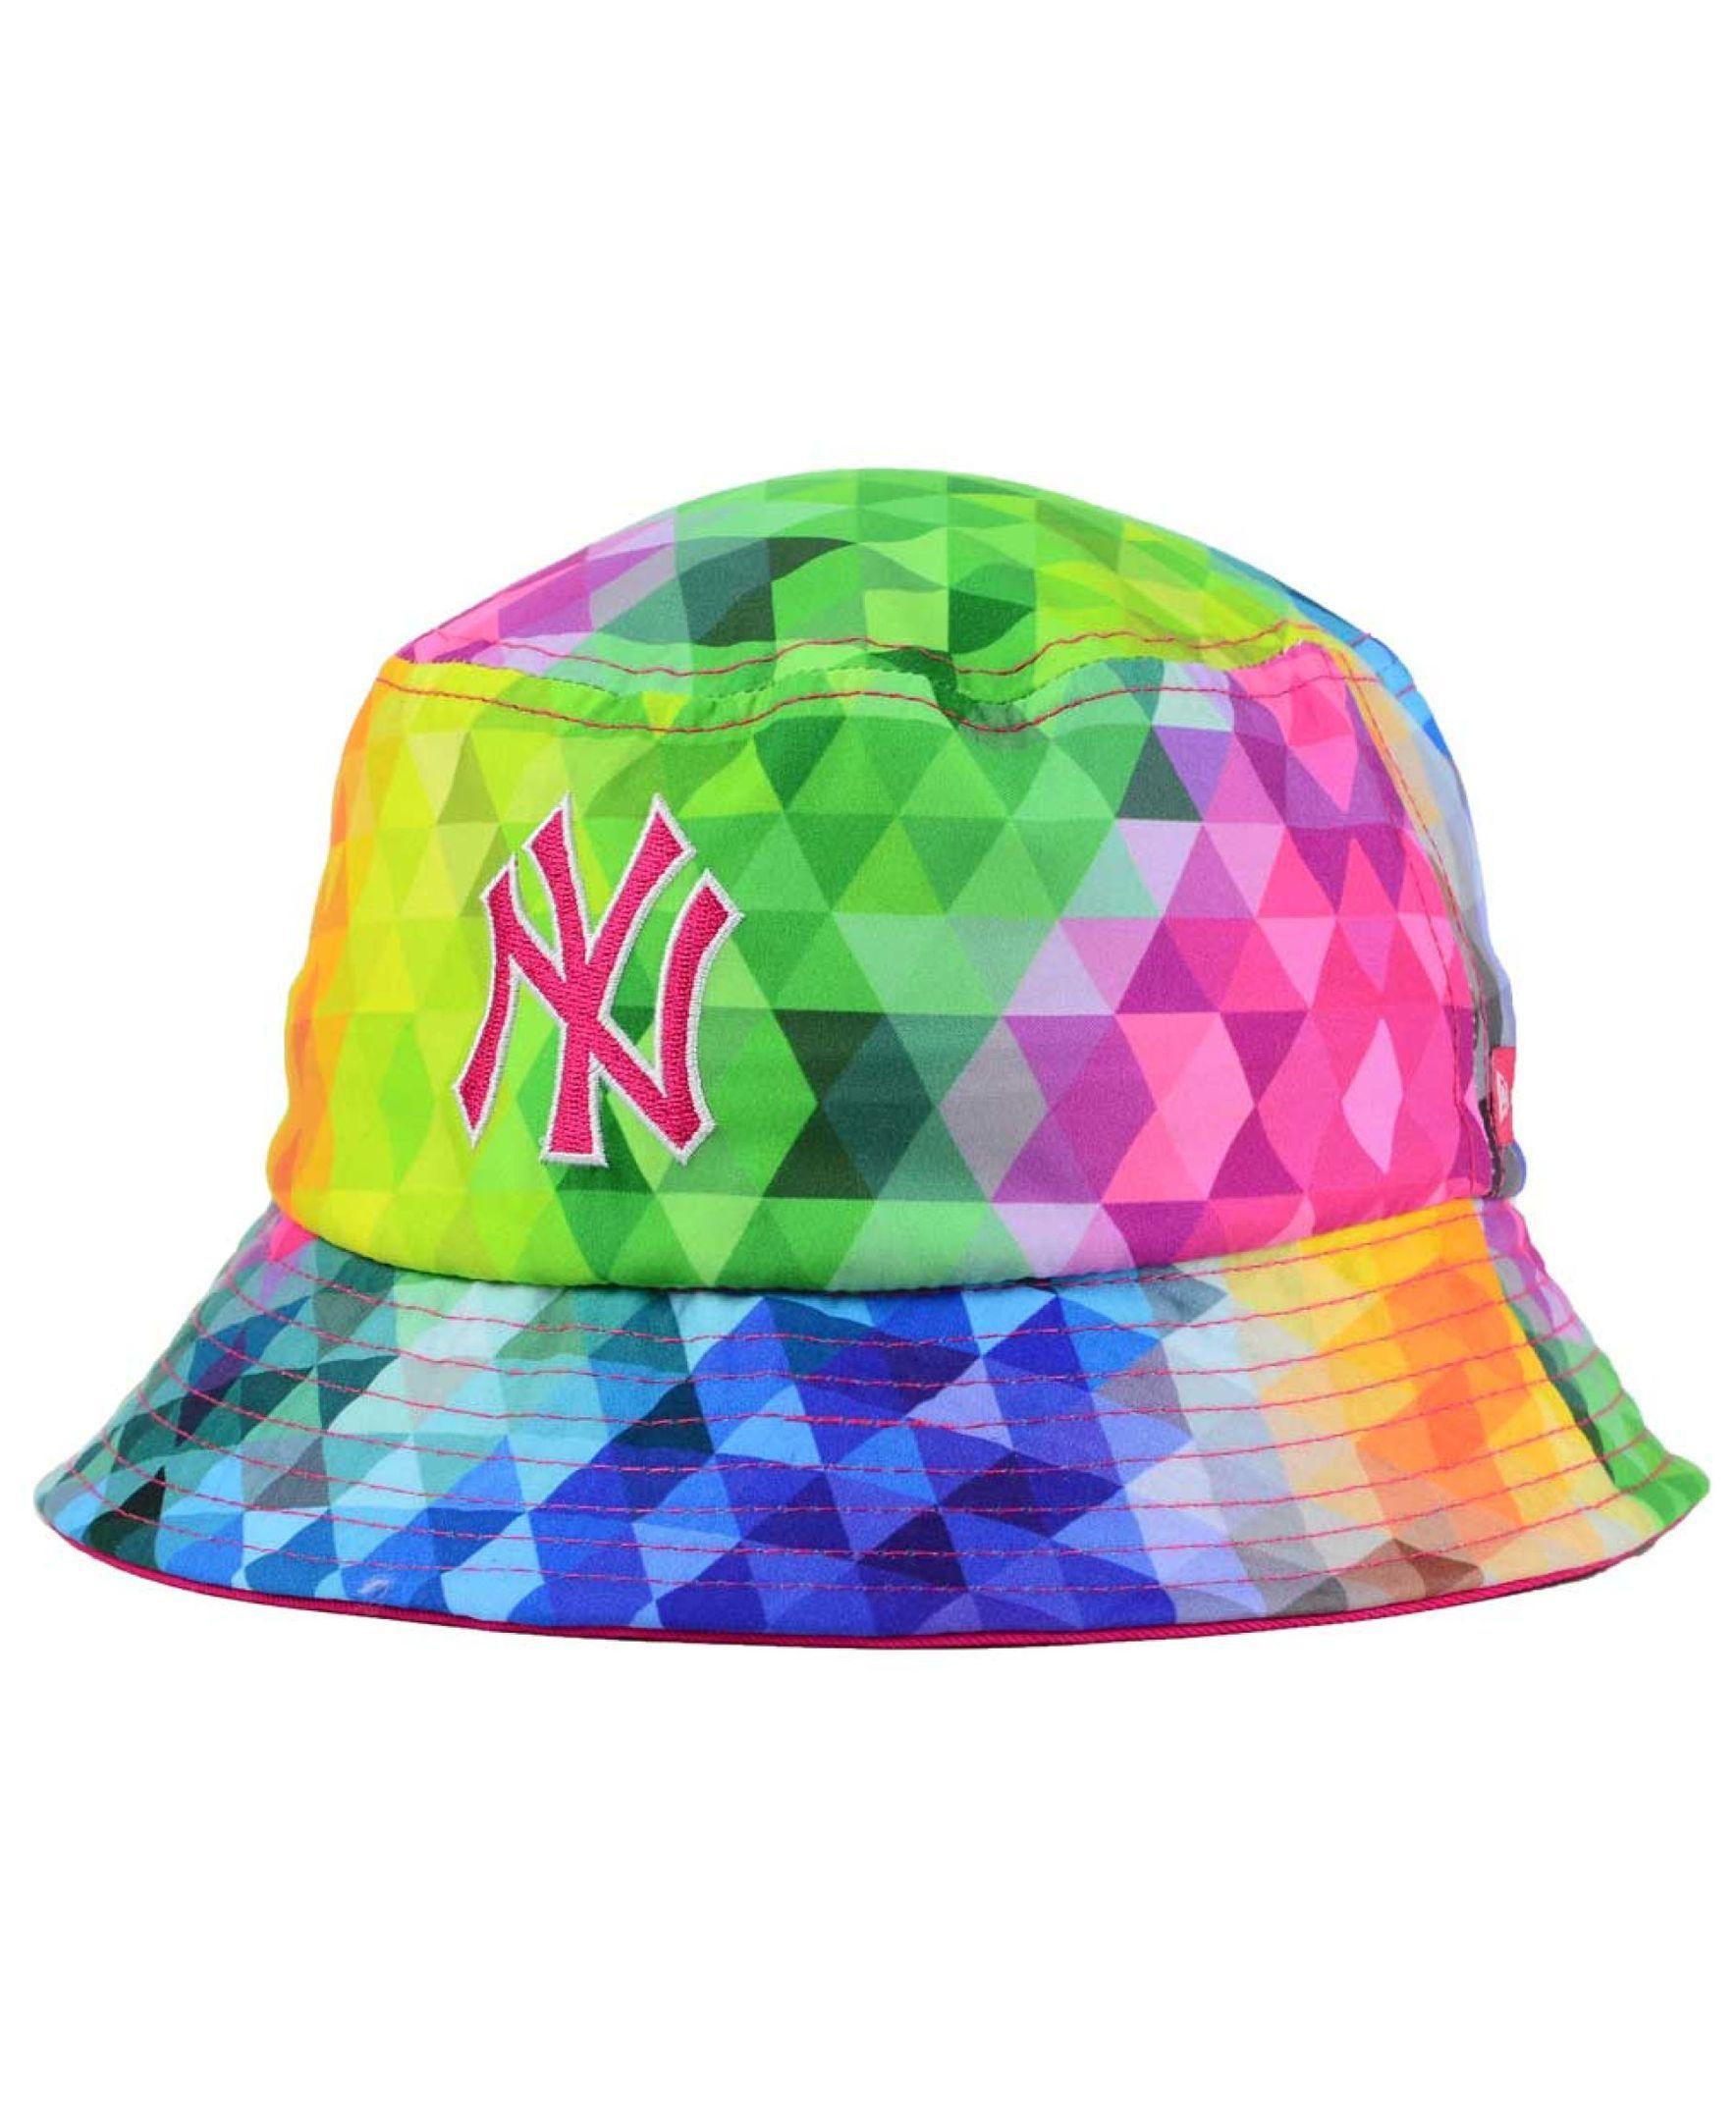 478c6f88f79 ... best new era kids new york yankees gem bucket hat adc13 45f21